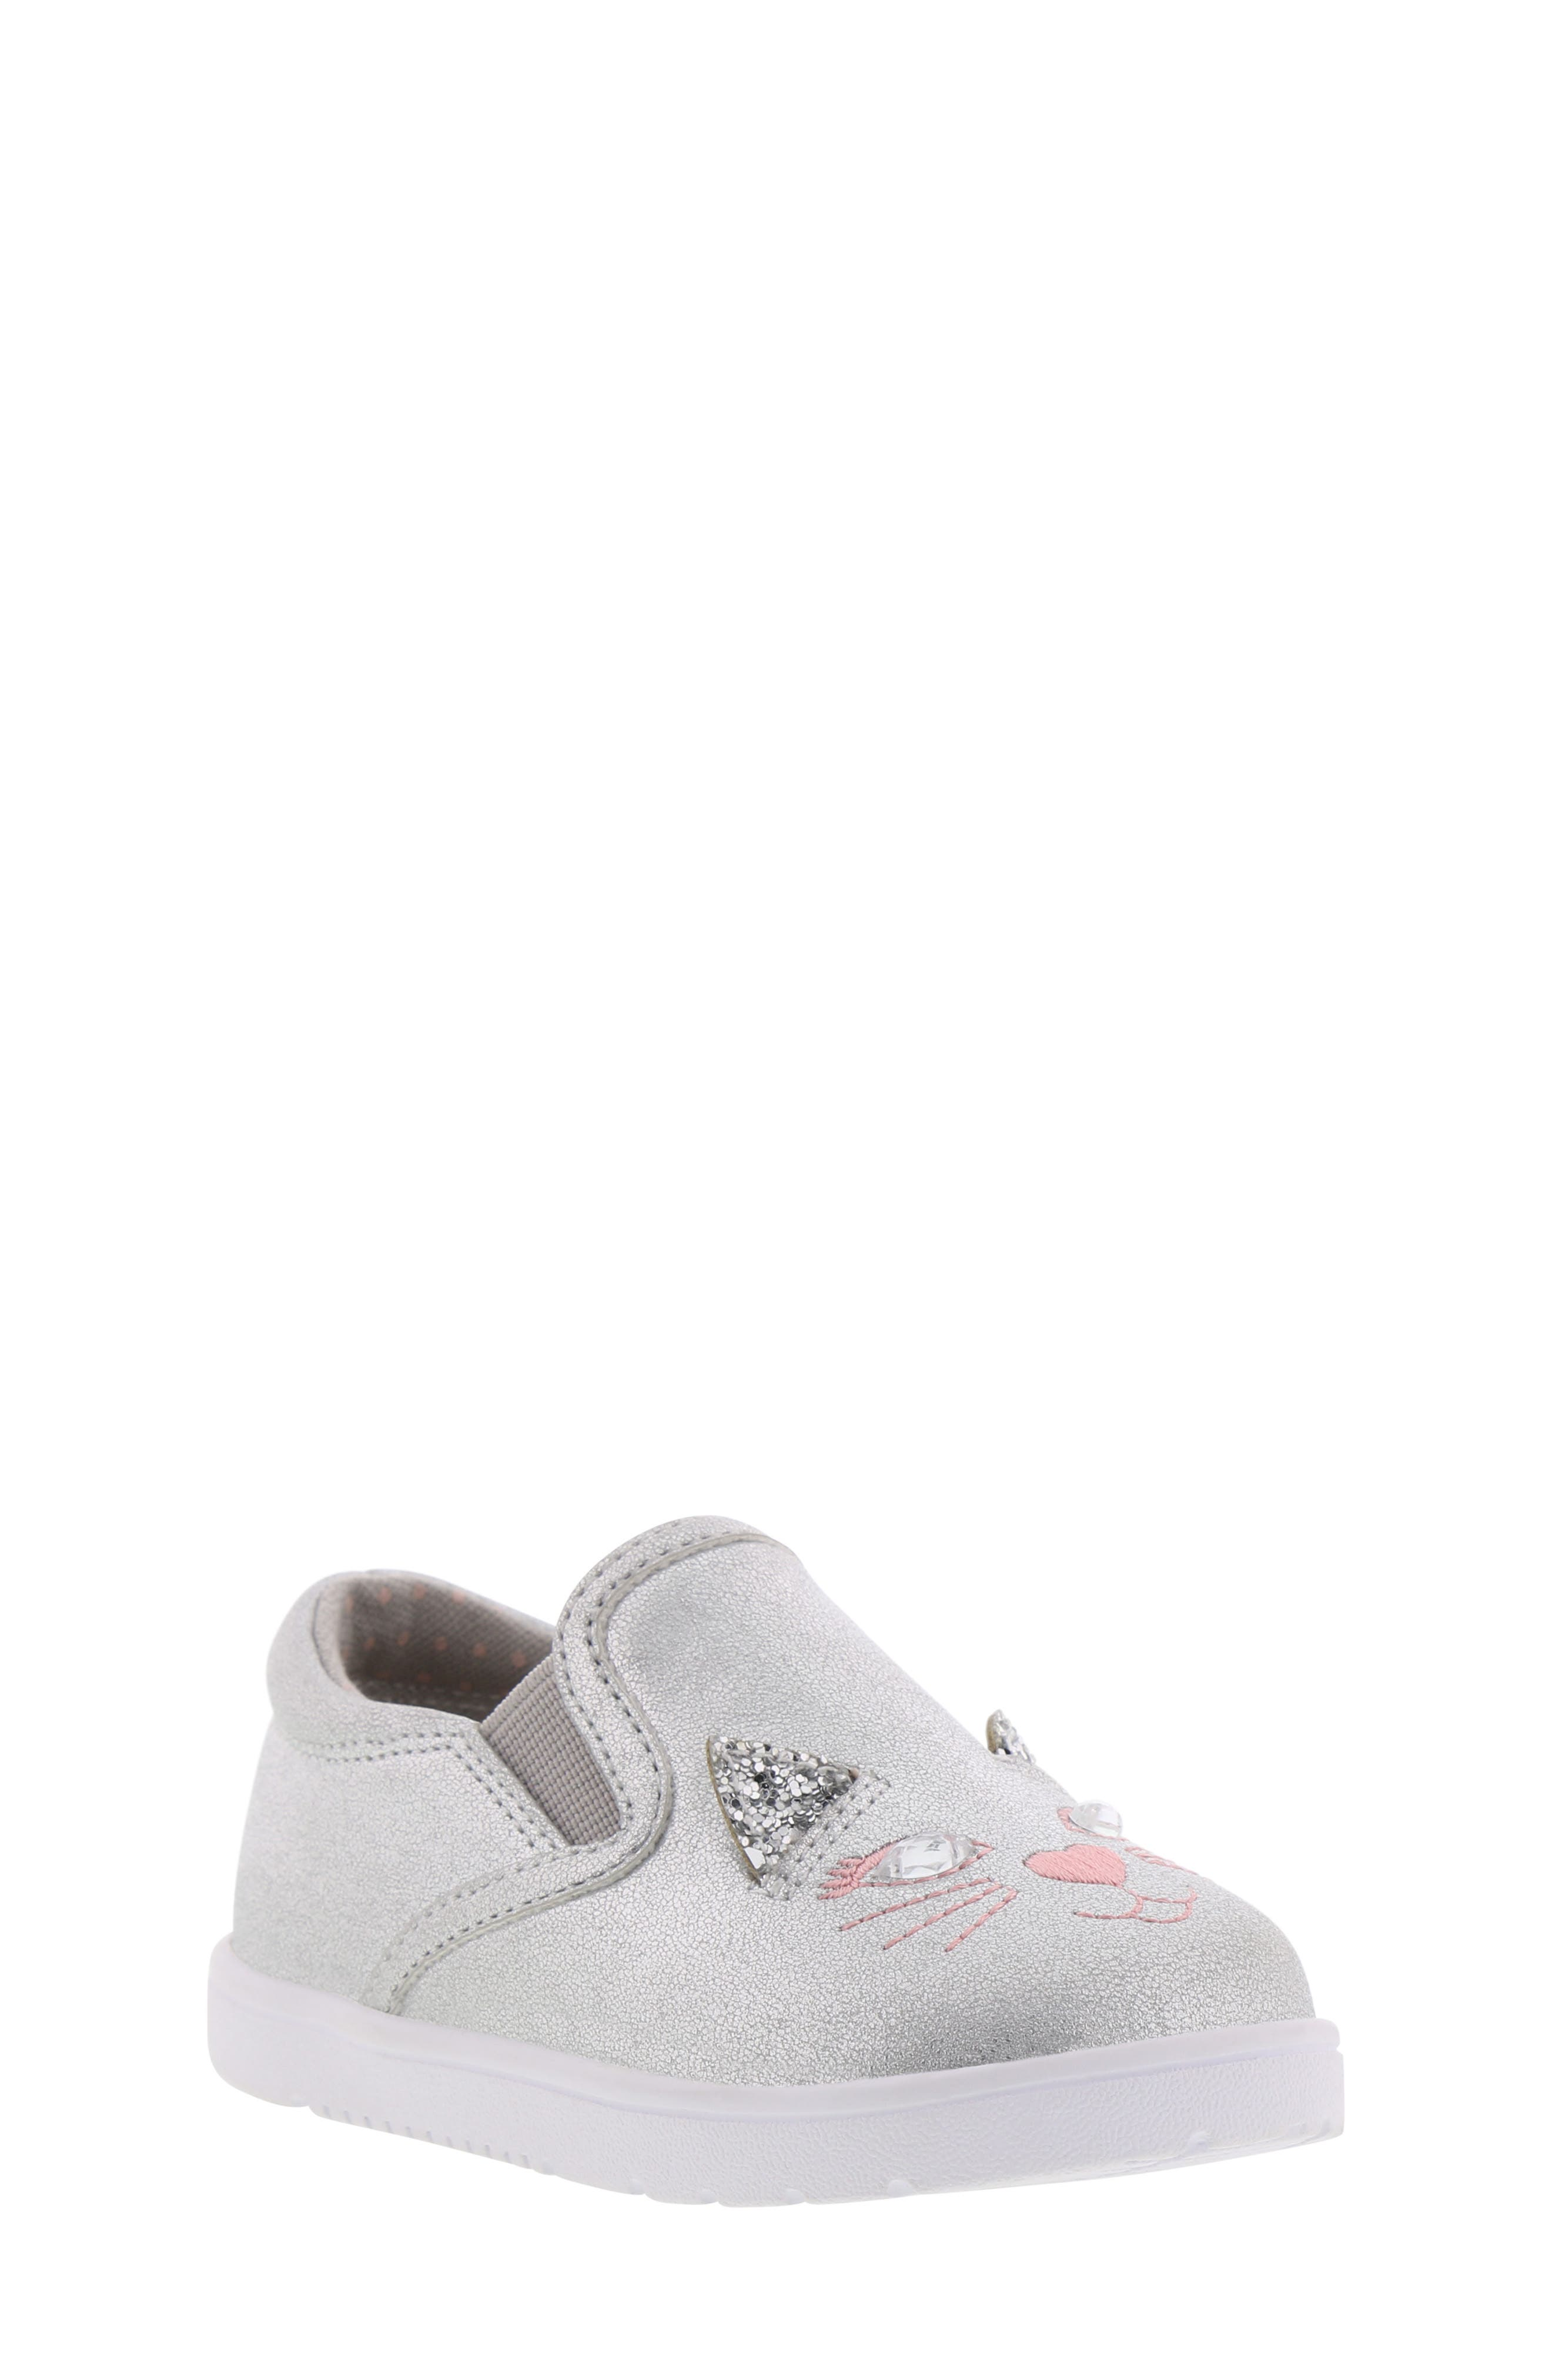 BØRN Bailey Jaslyna Slip-On Glitter Sneaker, Main, color, SILVER